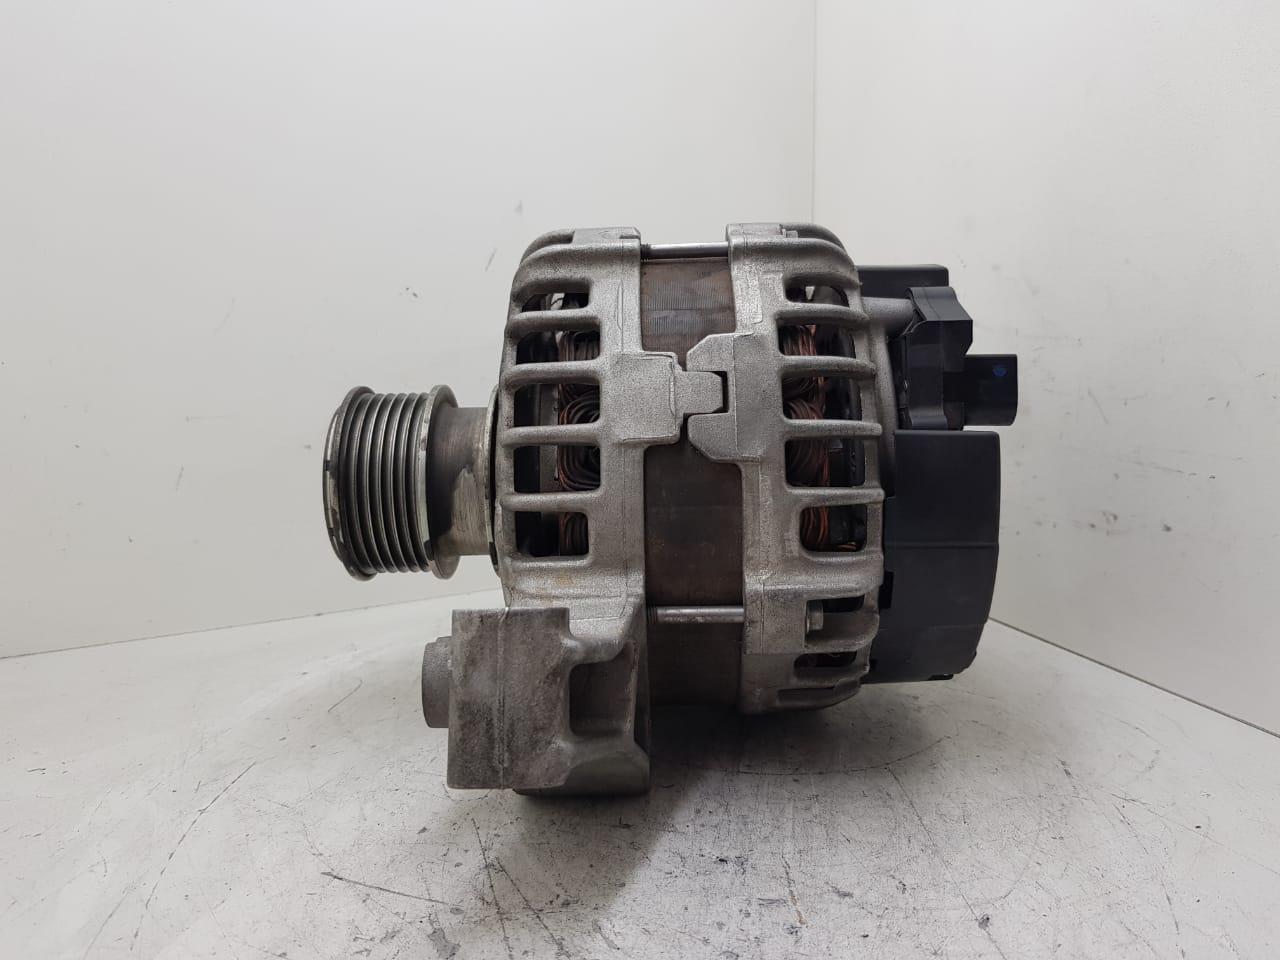 Alternador Land Rover Evoque Turbo Jaguar Bosch 14V 180AMP 0125811006 0125811034 BJ3210300 LR028121